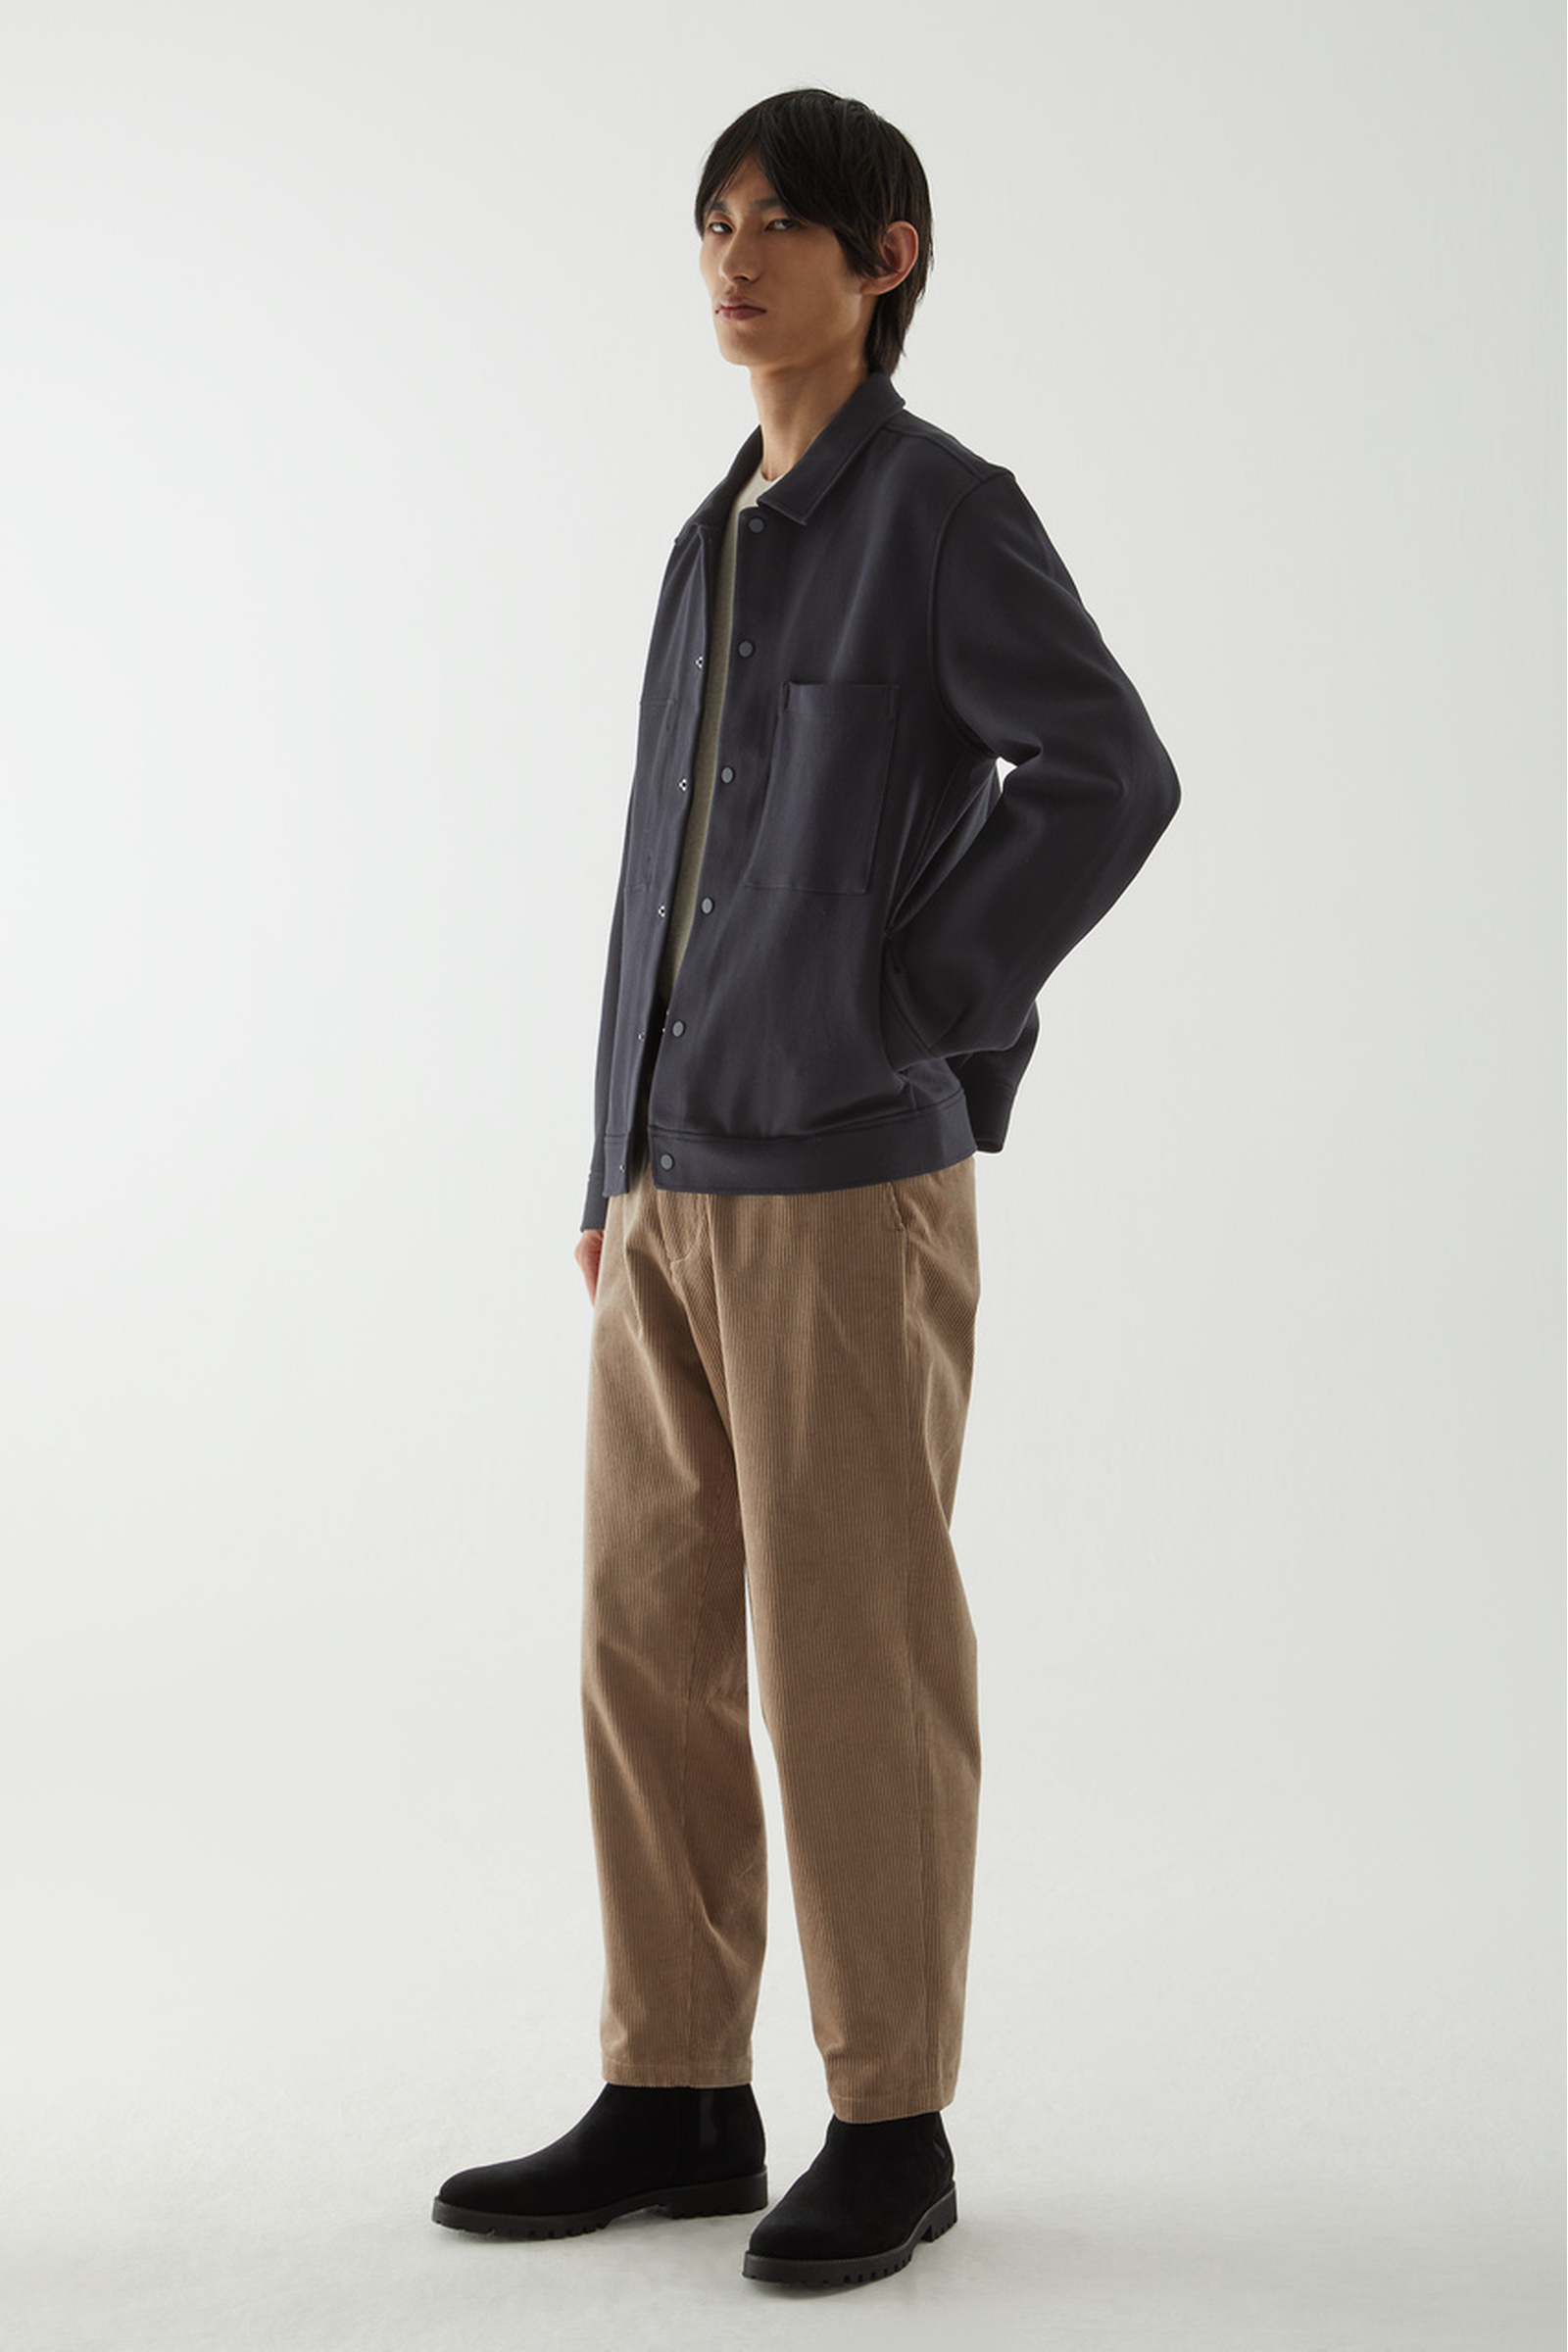 COS 트윌 셔츠 재킷의 미드나이트 블루컬러 ECOMLook입니다.